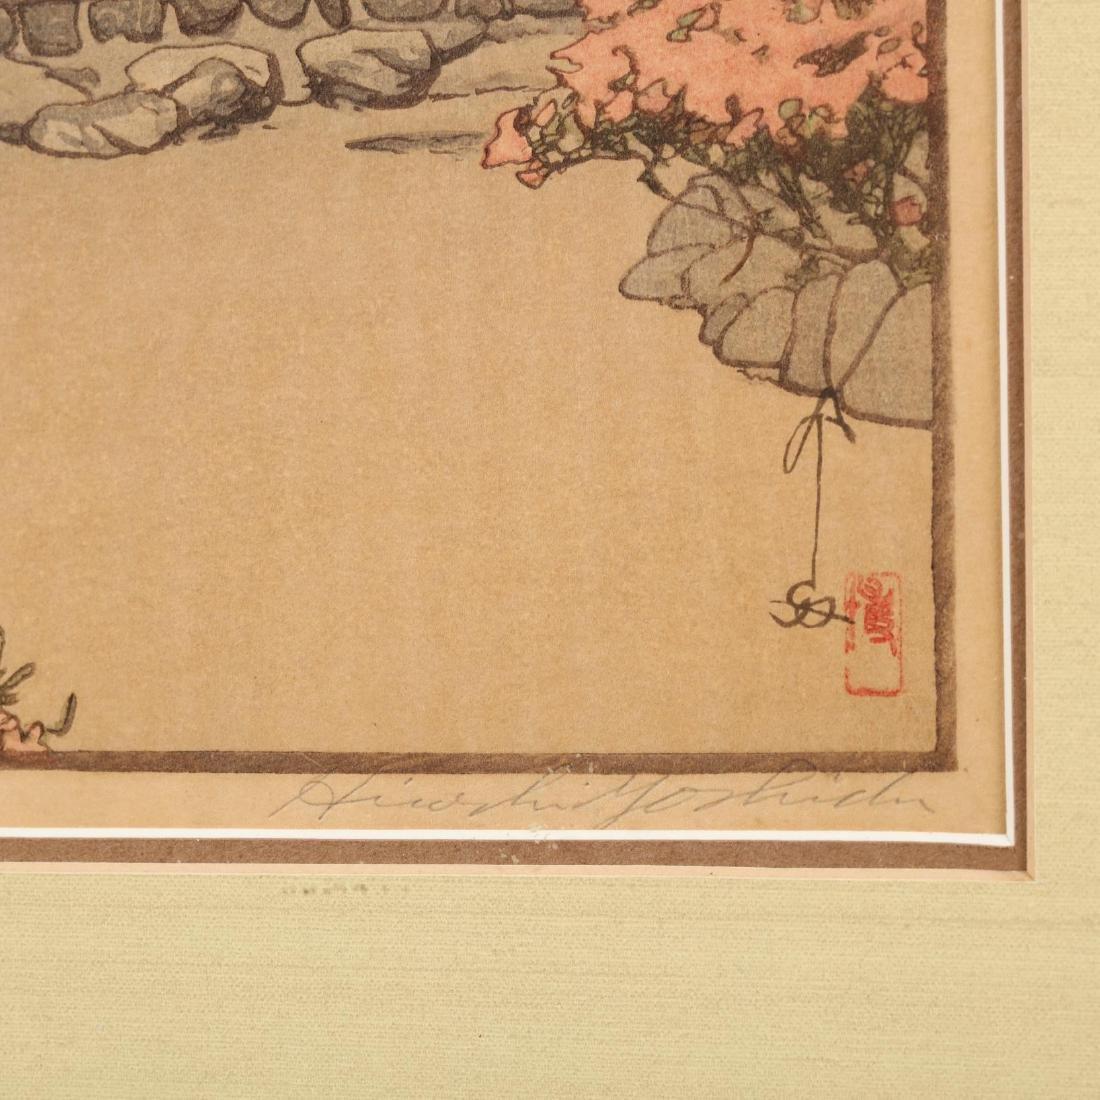 Three Japanese Woodblock Prints by Hiroshi Yoshida - 6